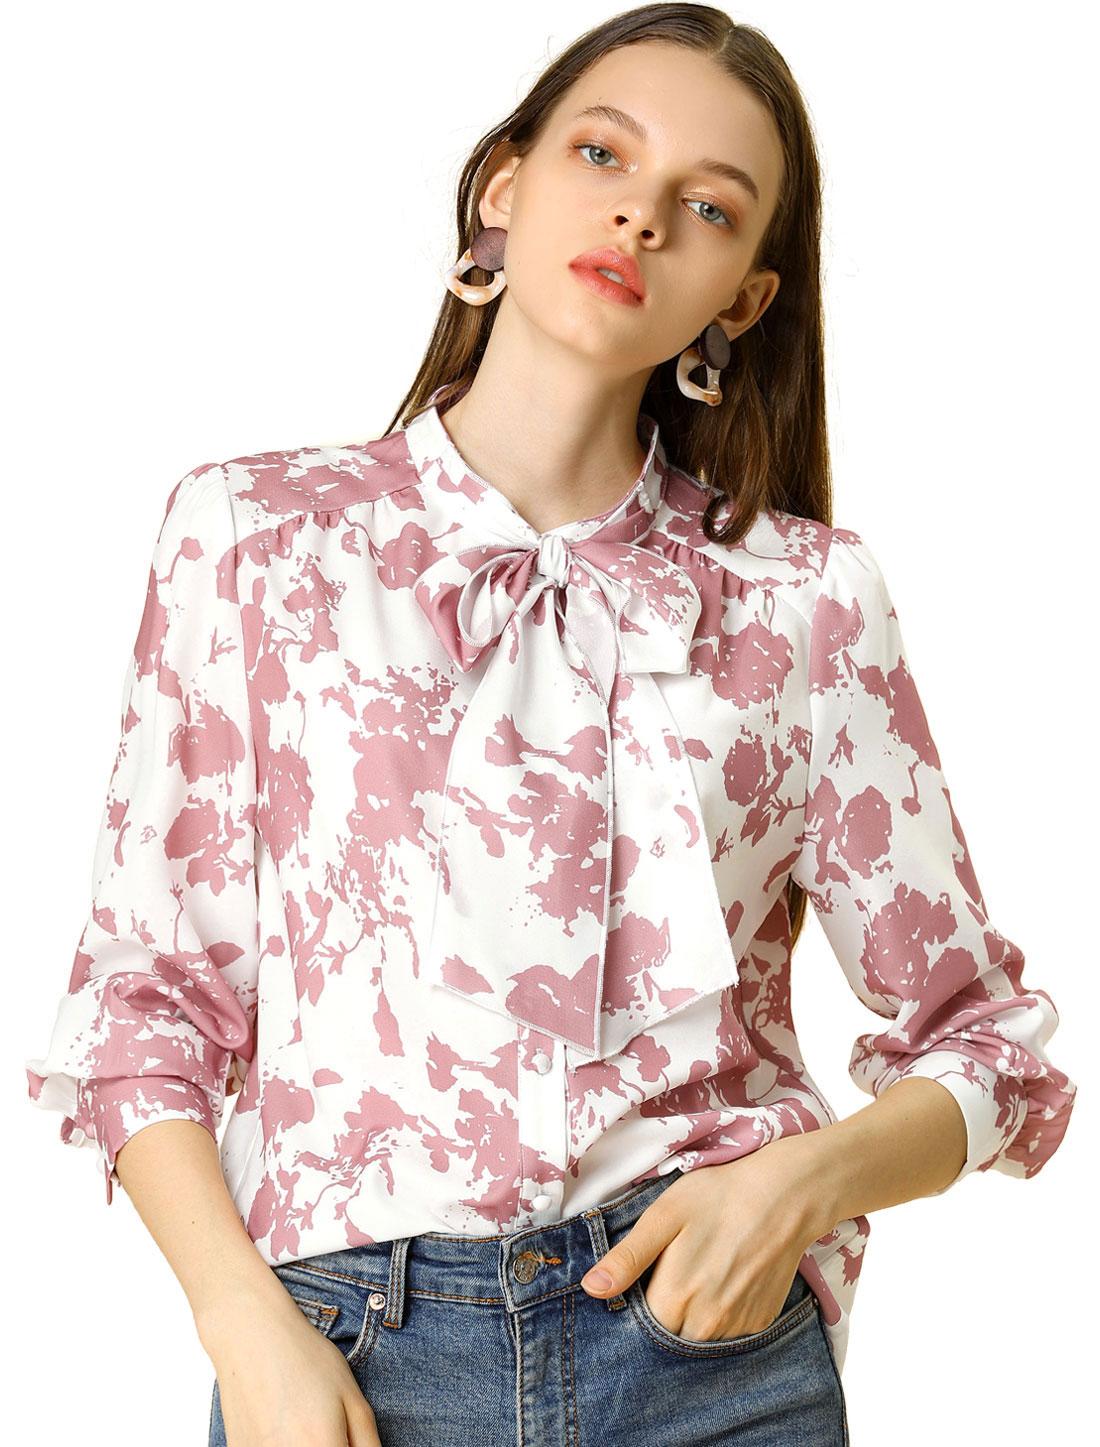 Allegra K Women's Floral Ruffle Sleeves Button Up Blouse Tie Neck Shirt White XL